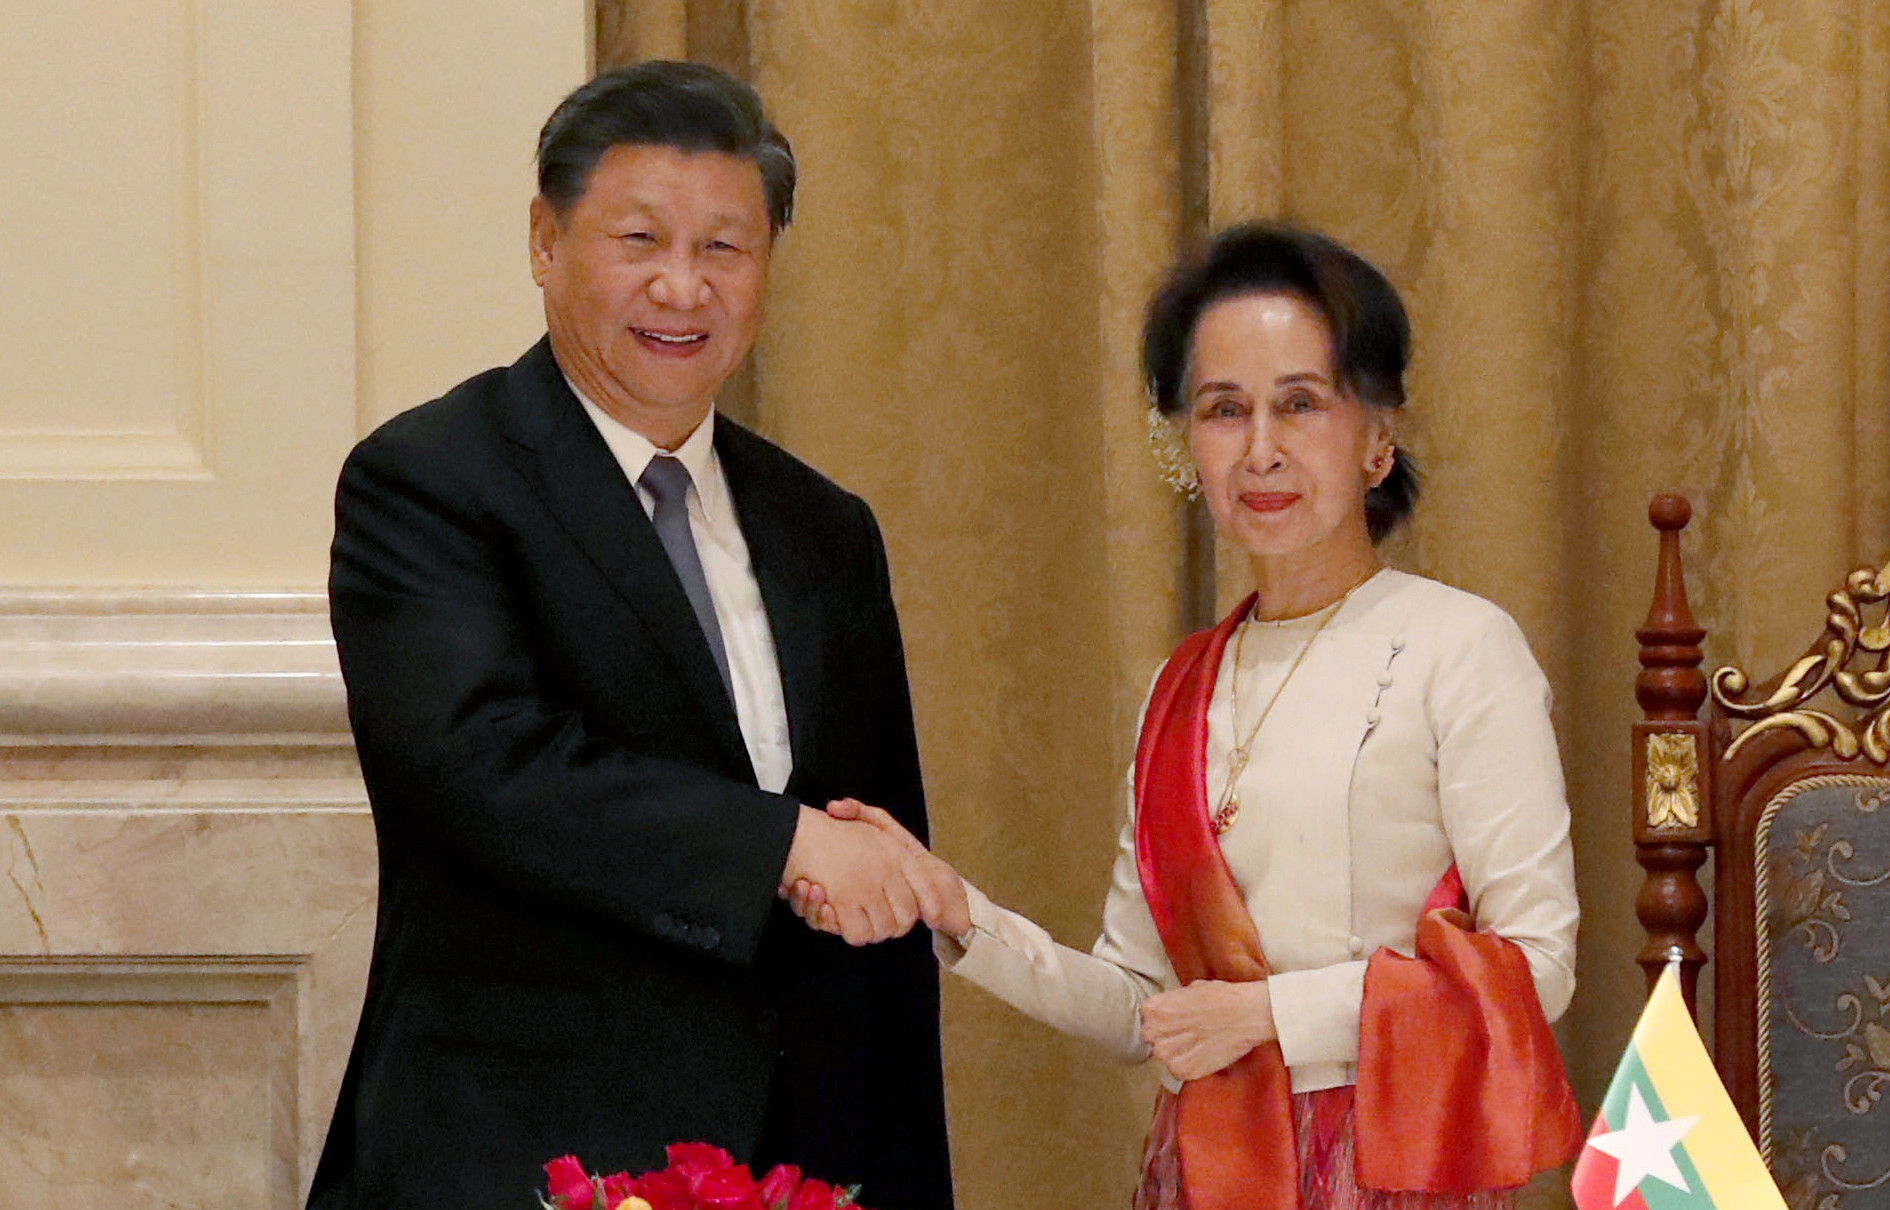 Facebook produces profane translation of Chinese President Xi Jinping's name, apologizes